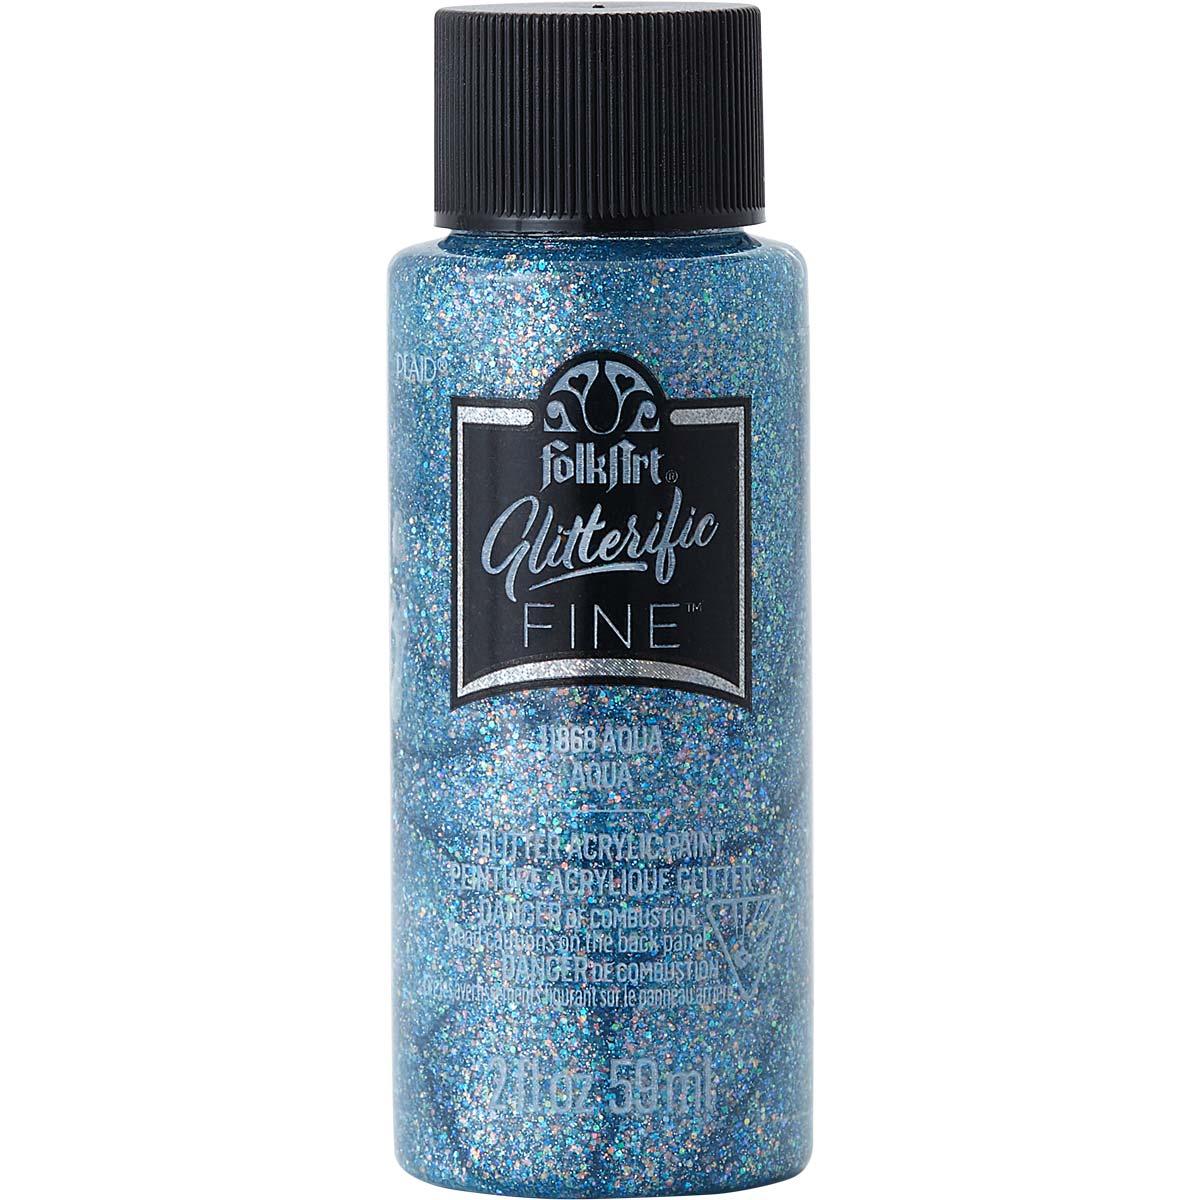 FolkArt ® Glitterific Fine™ Acrylic Paint - Aqua, 2 oz. - 11868